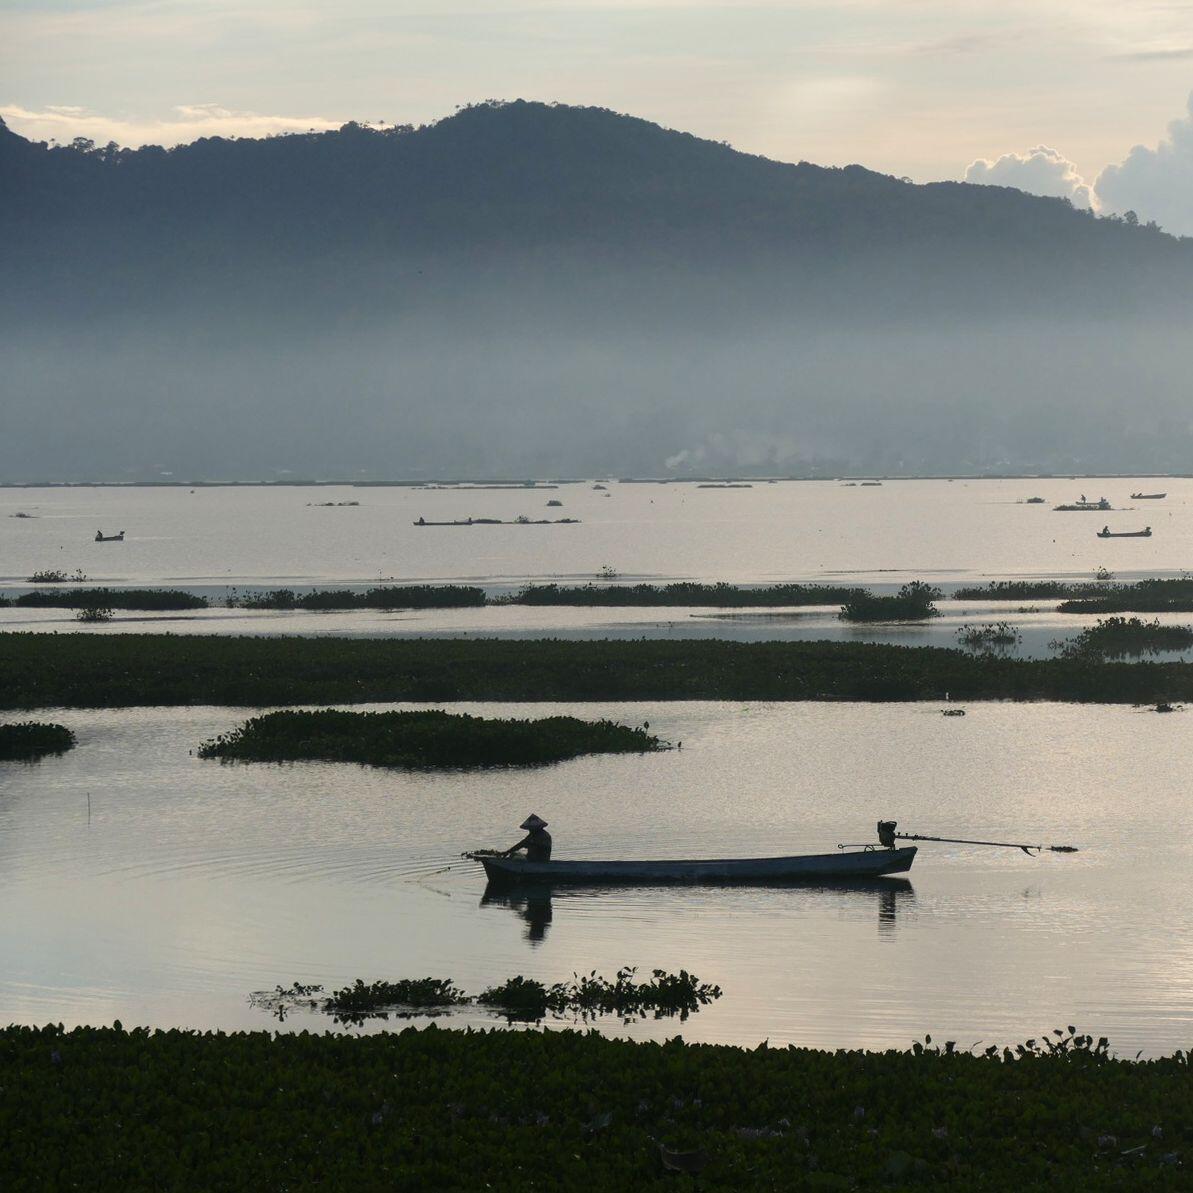 A fisherman plies his trade near sunrise. Noah Strycker